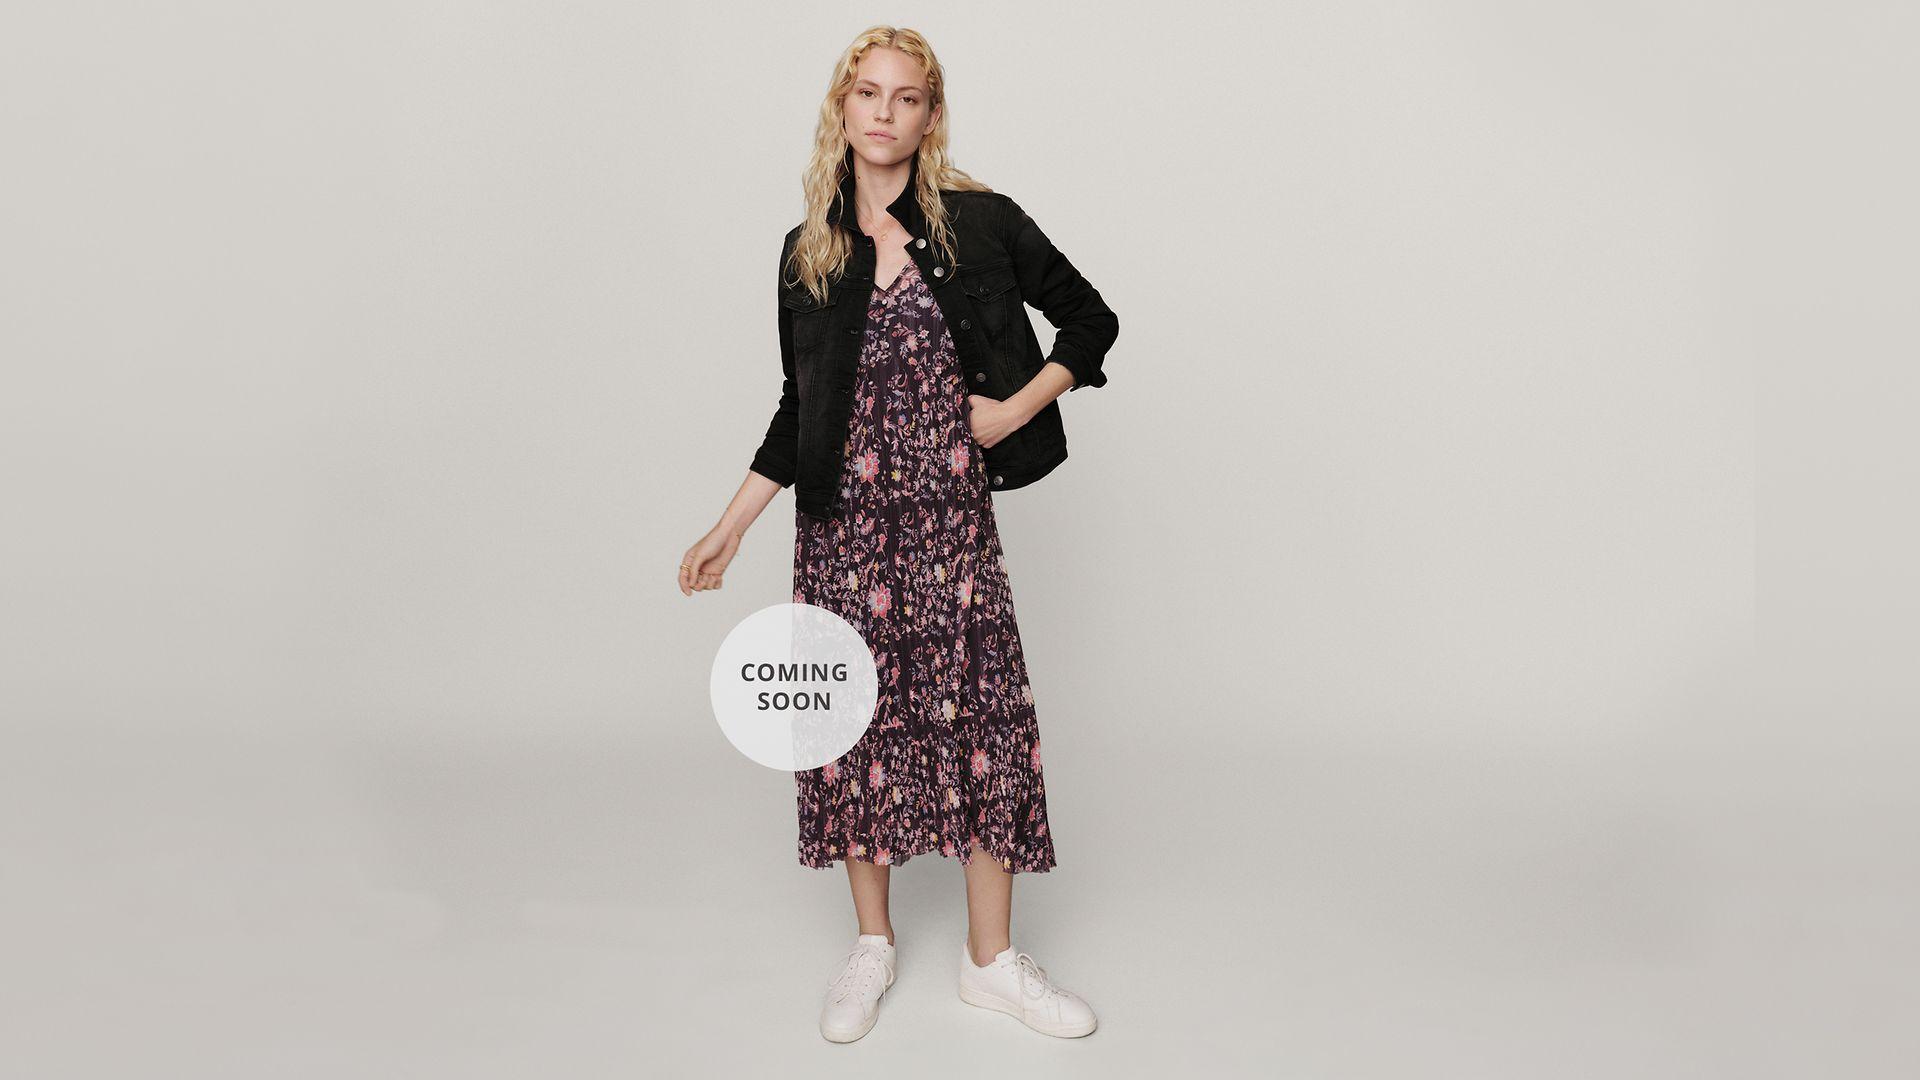 030721 - Women - Inspiration - Lookbook - Dressed up for Summer - Hero Large 3 - IMG